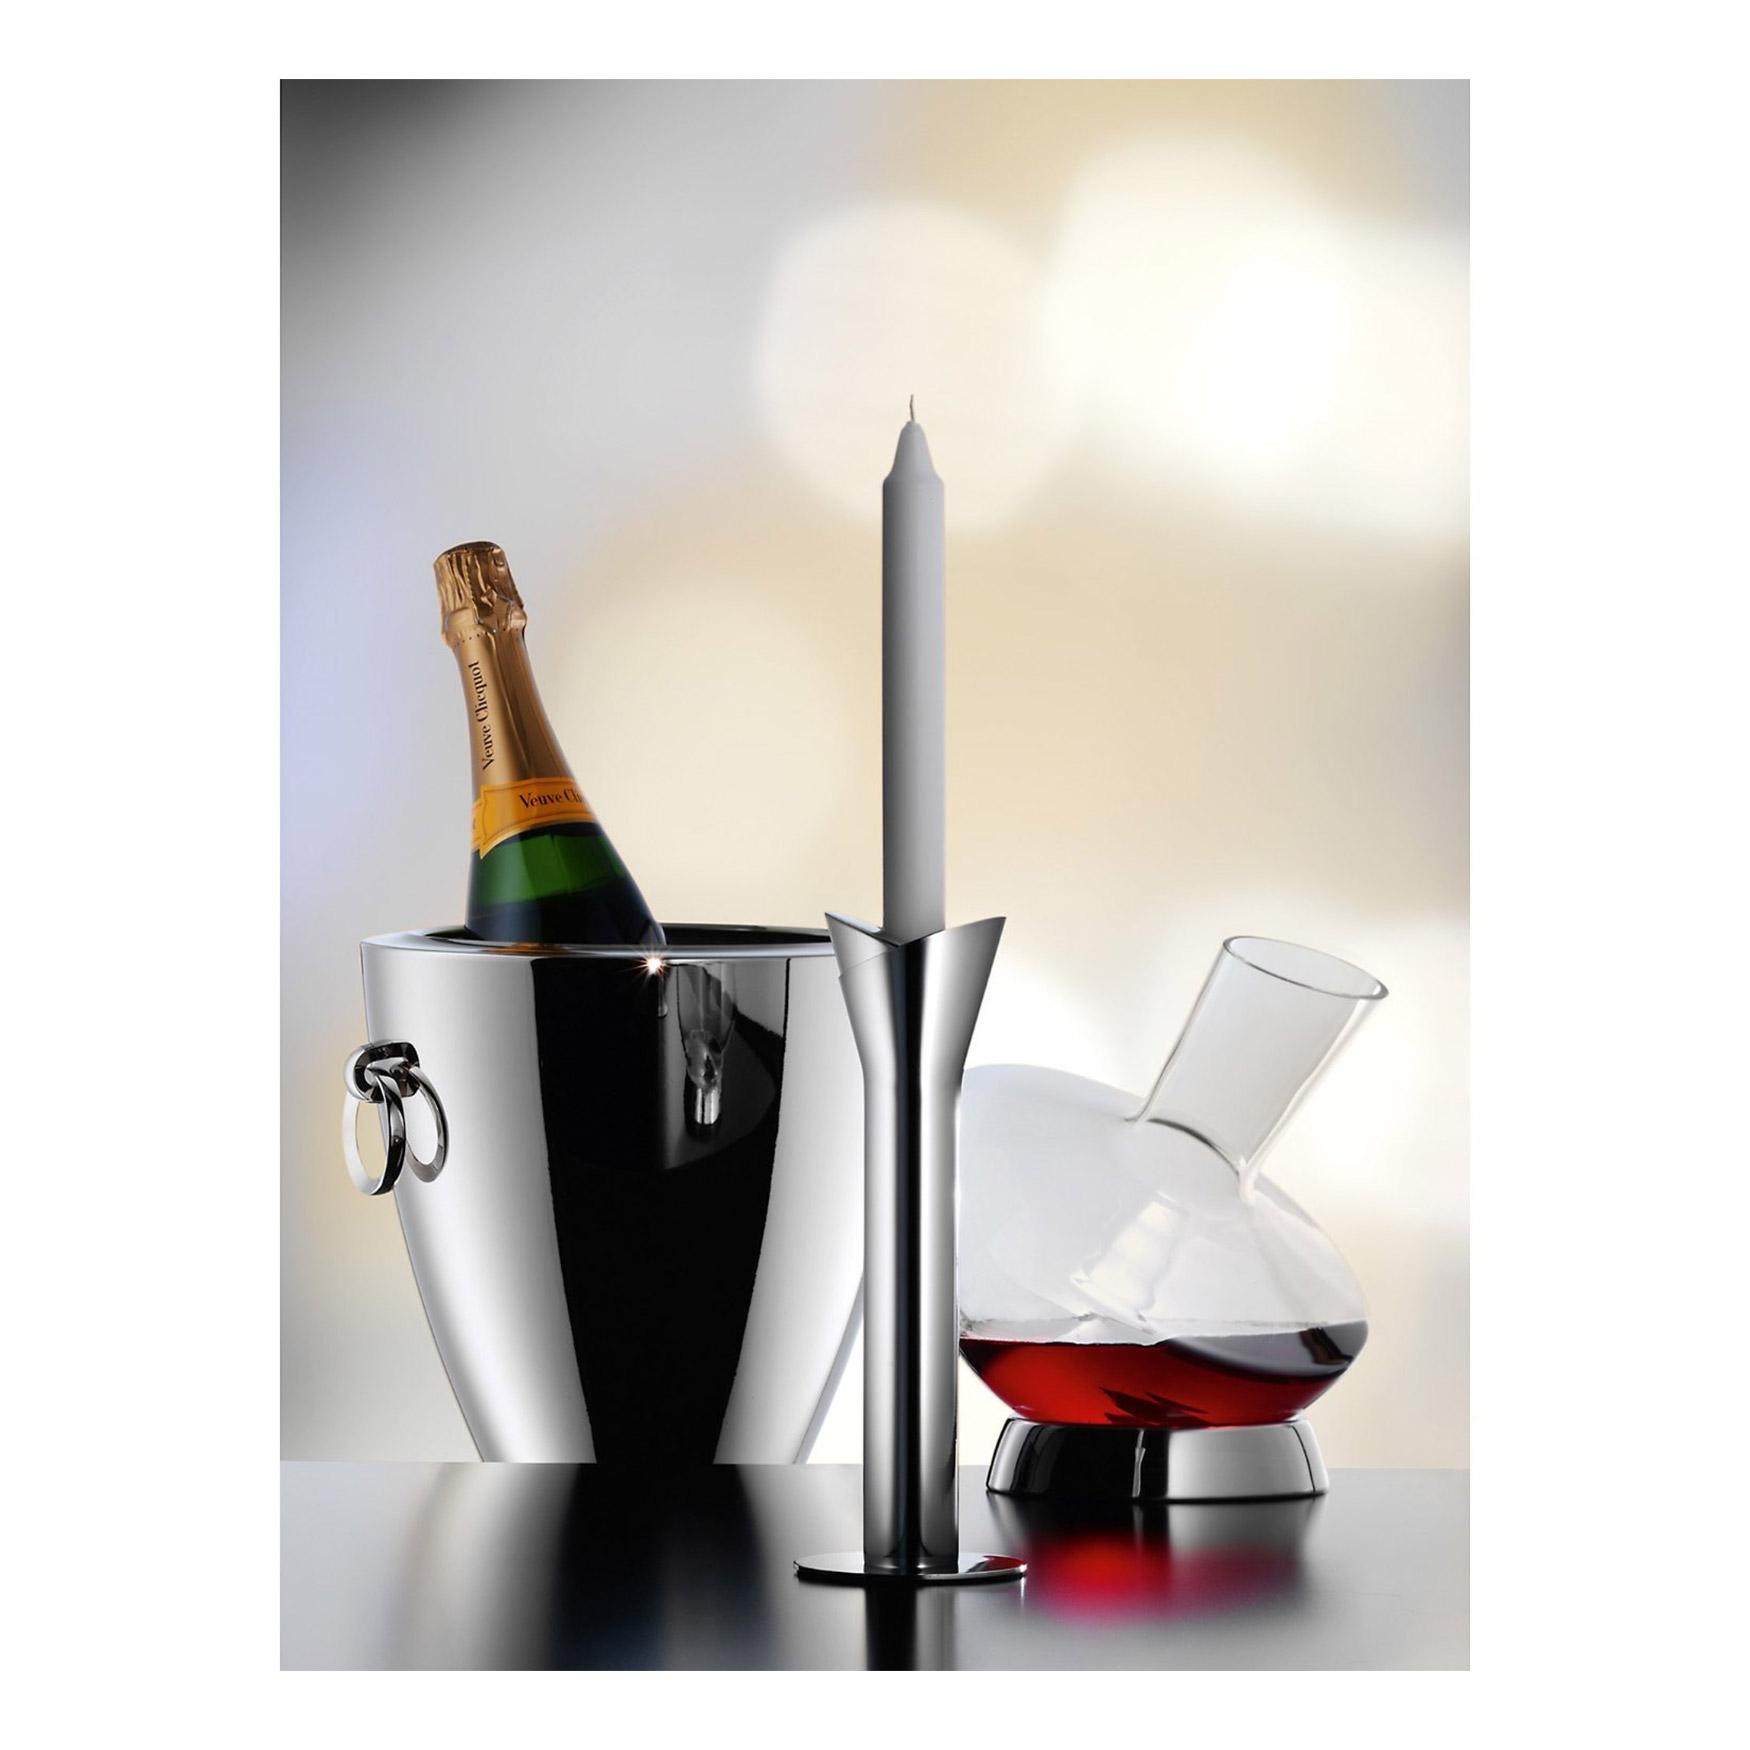 WMF Champagnerkühler Jette JOOP - GRATIS VERSAND!